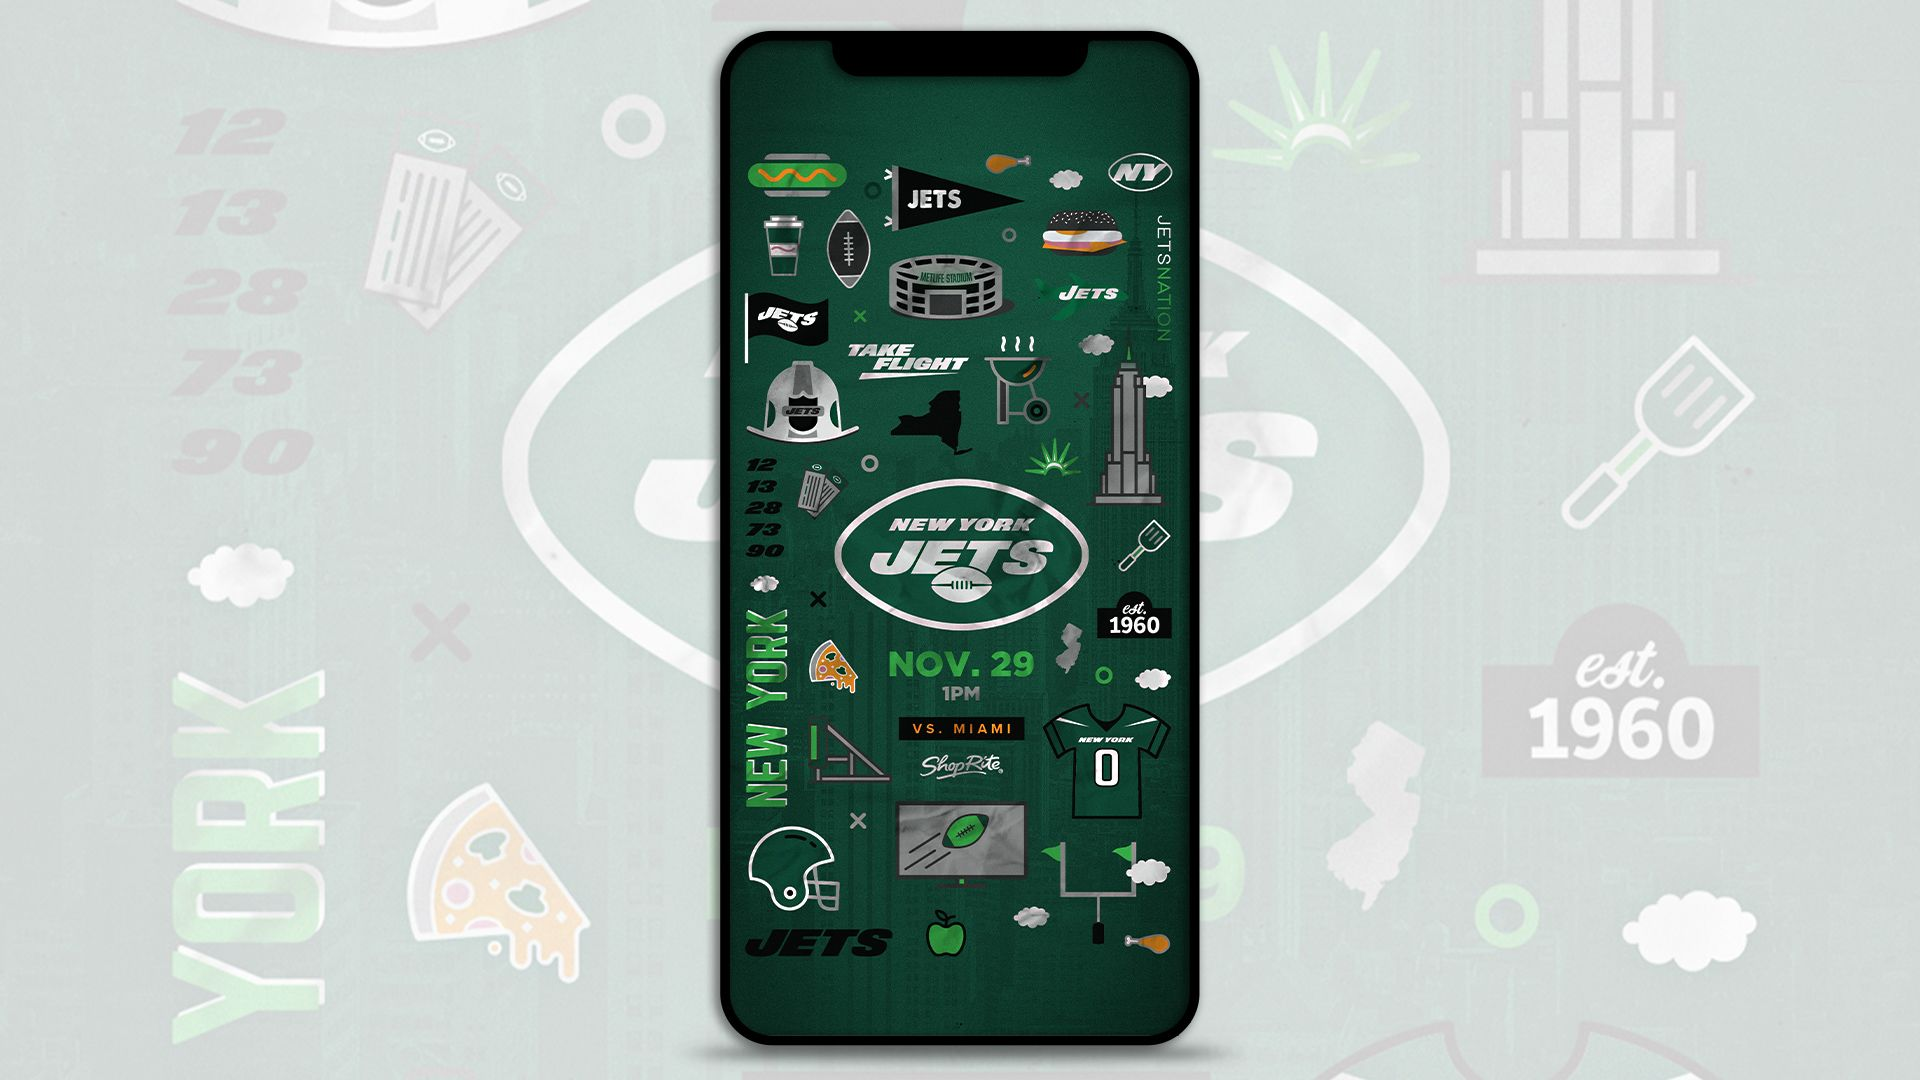 Dolphins vs. Jets | Nov. 29